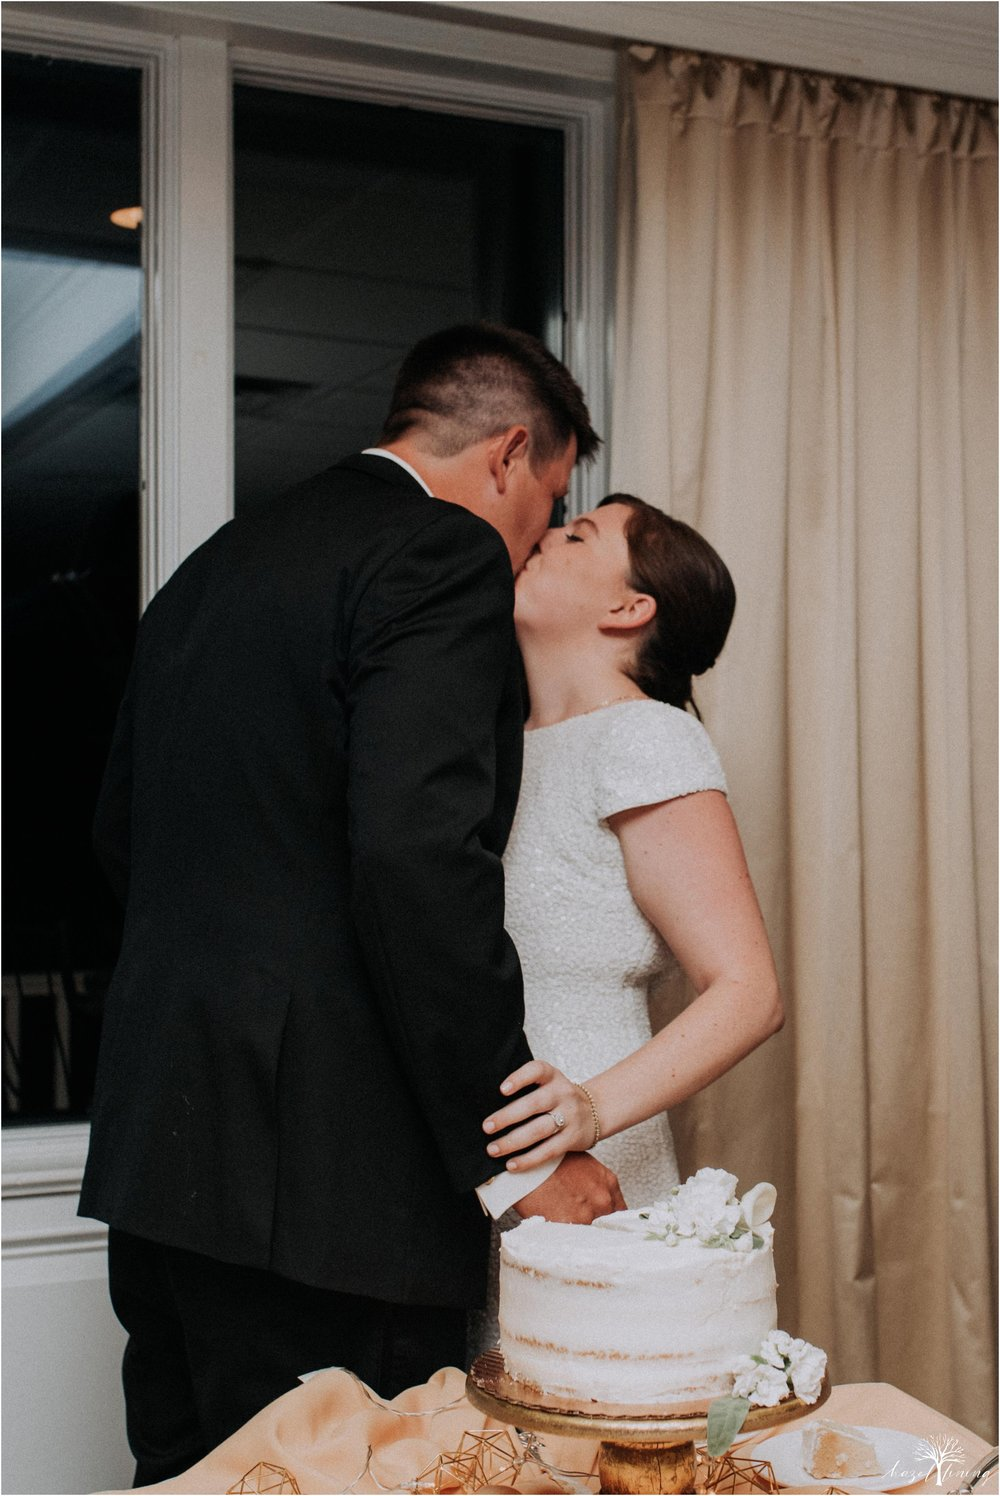 elizabeth-doelp-andrew-foreback-middletown-country-club-summer-langhorne-pennsylvania-wedding-hazel-lining-travel-wedding-elopement-photography_0159.jpg